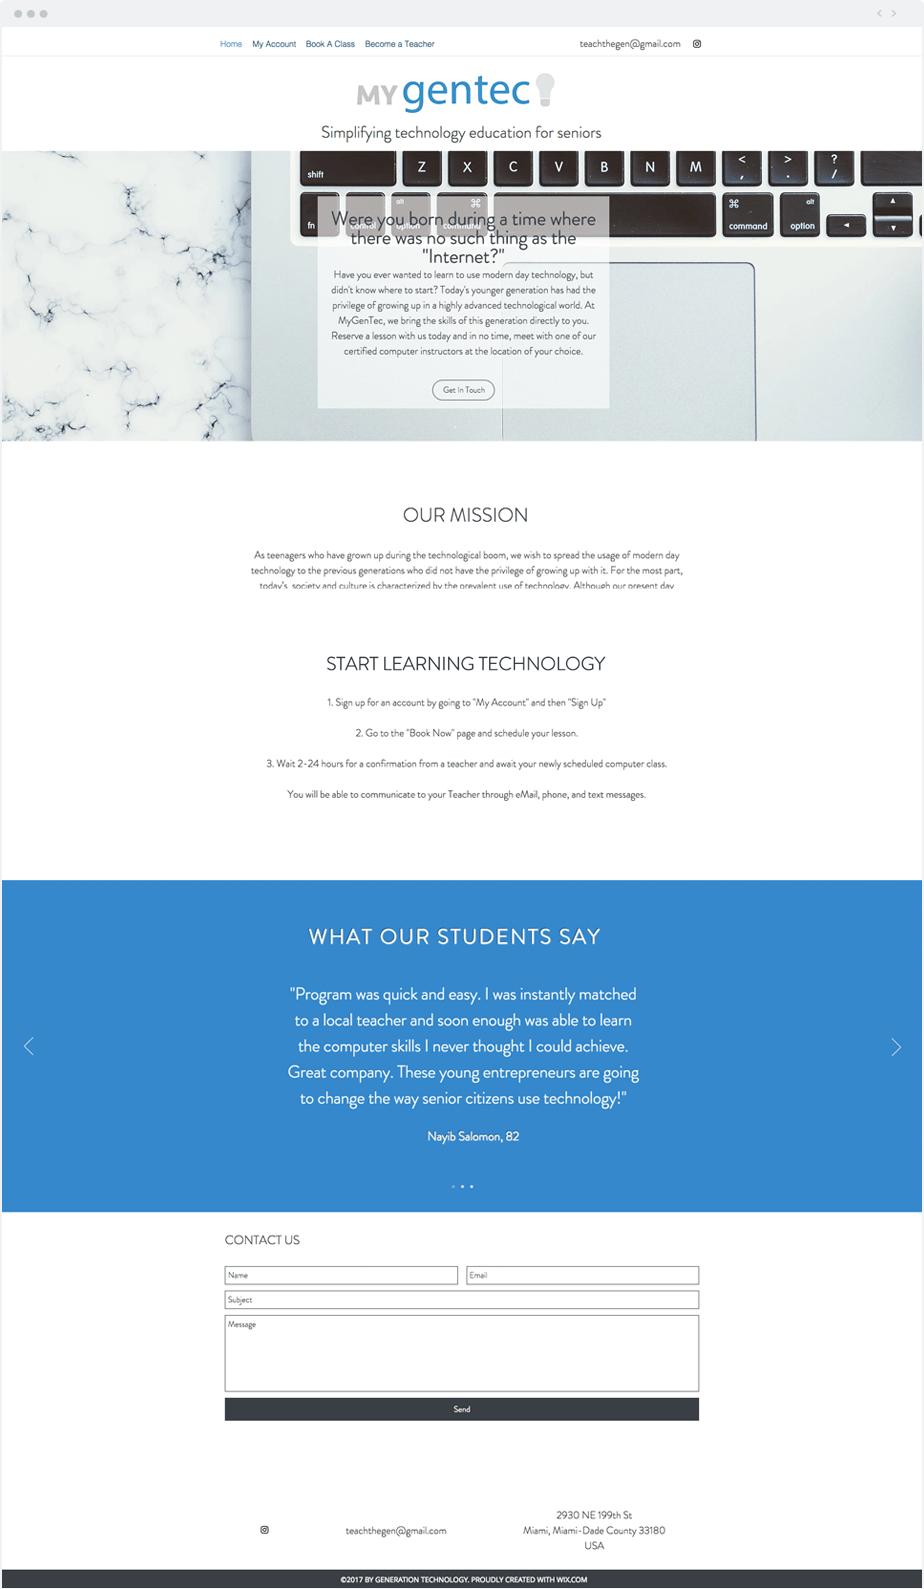 Ideas de Negocio Wix - MyGentec